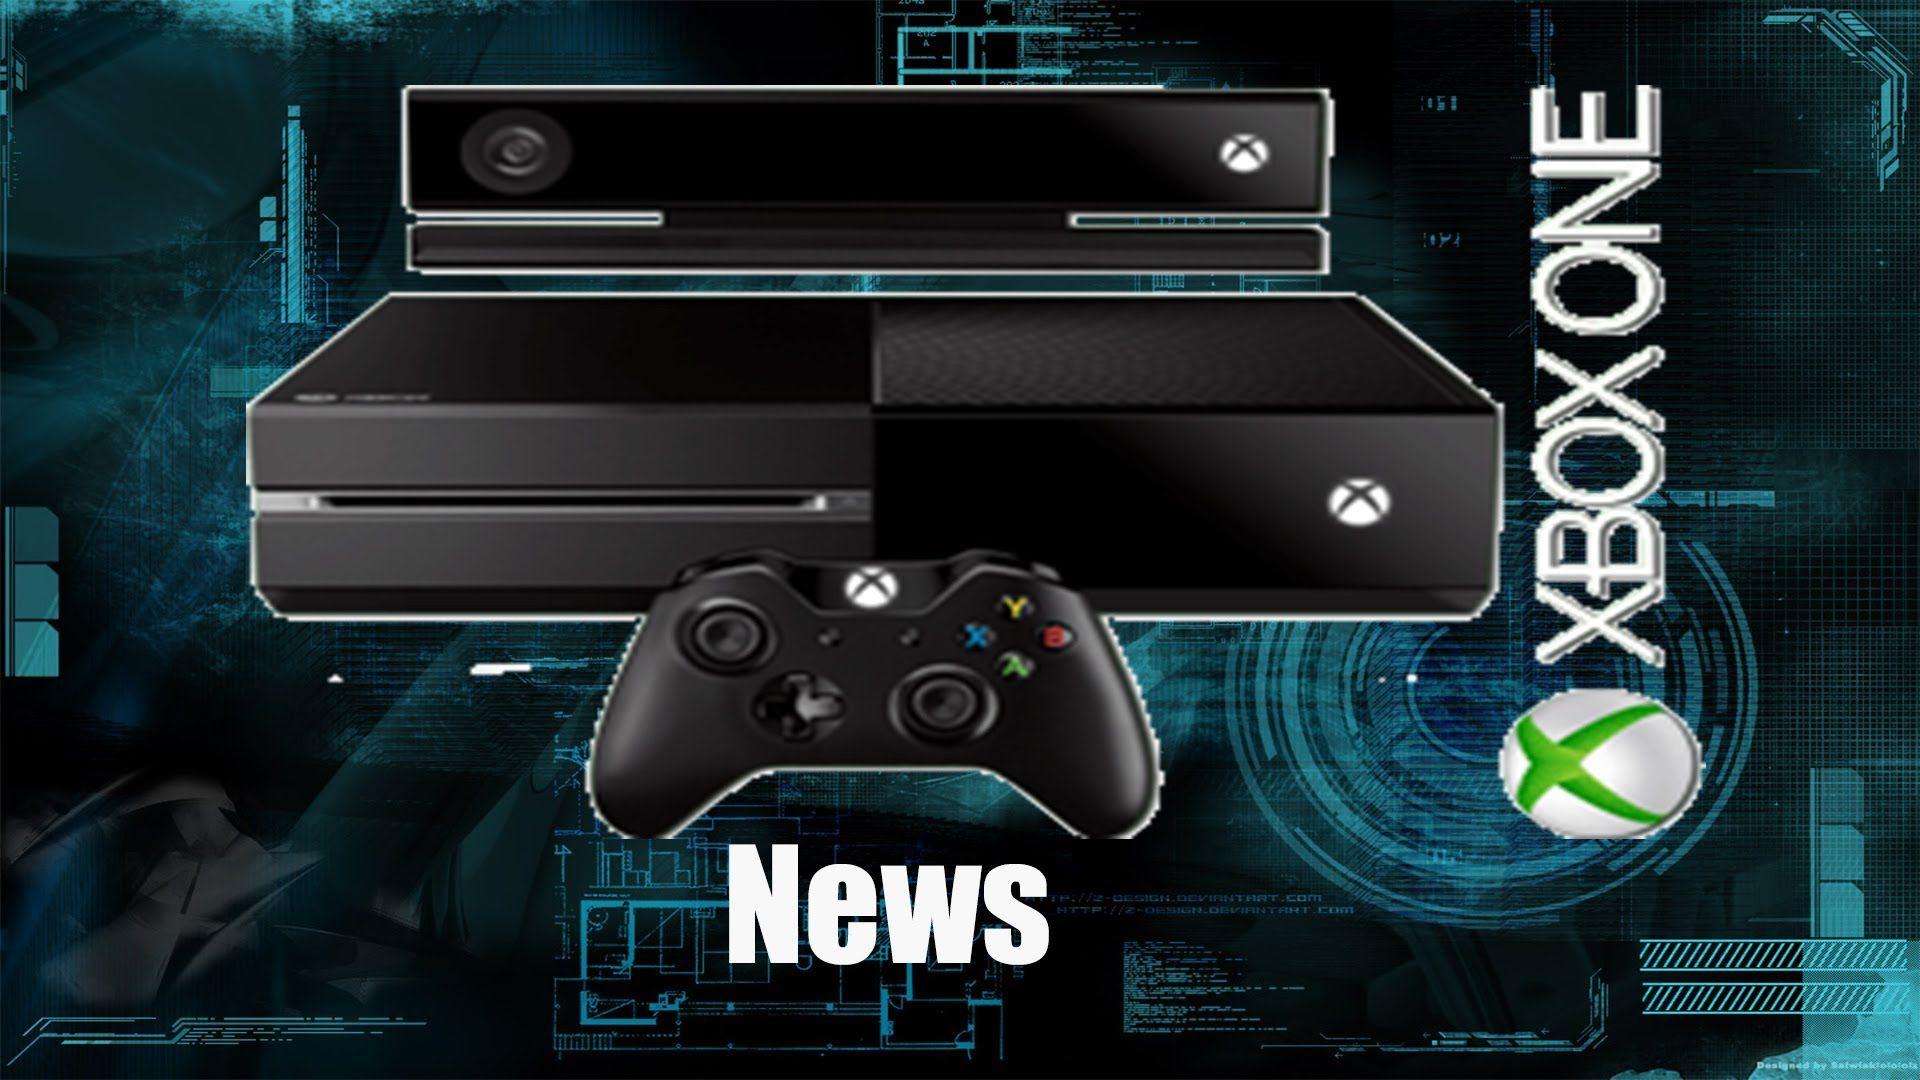 Xbox One News This Week Cross Platform Play No Real Names